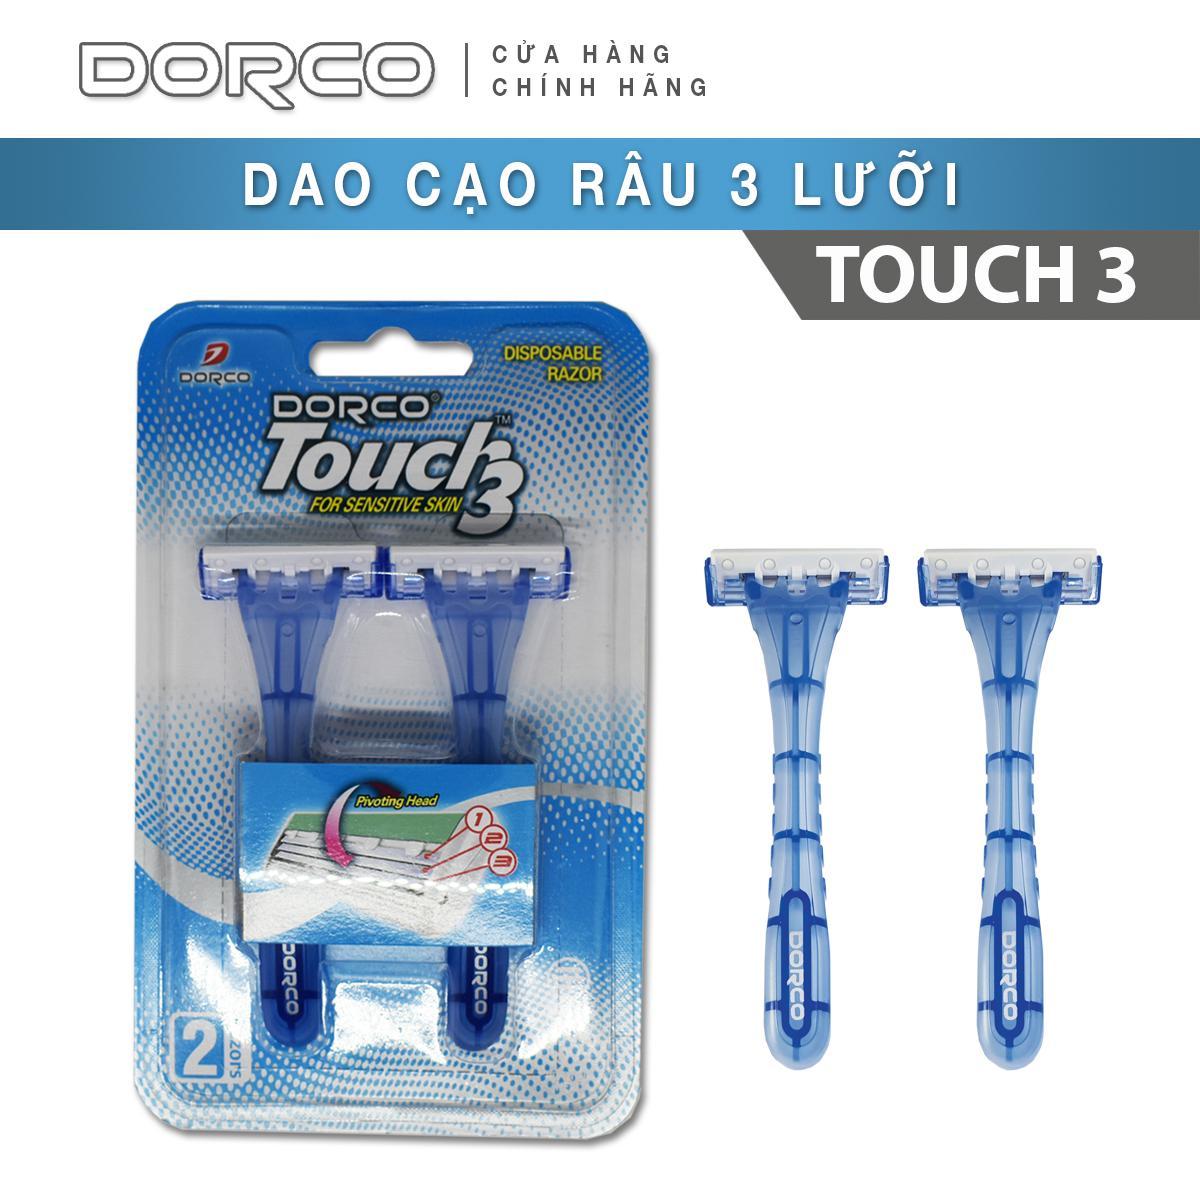 DAO CẠO 3 LƯỠI DORCO TOUCH 3 (Gói 02 dao cạo)